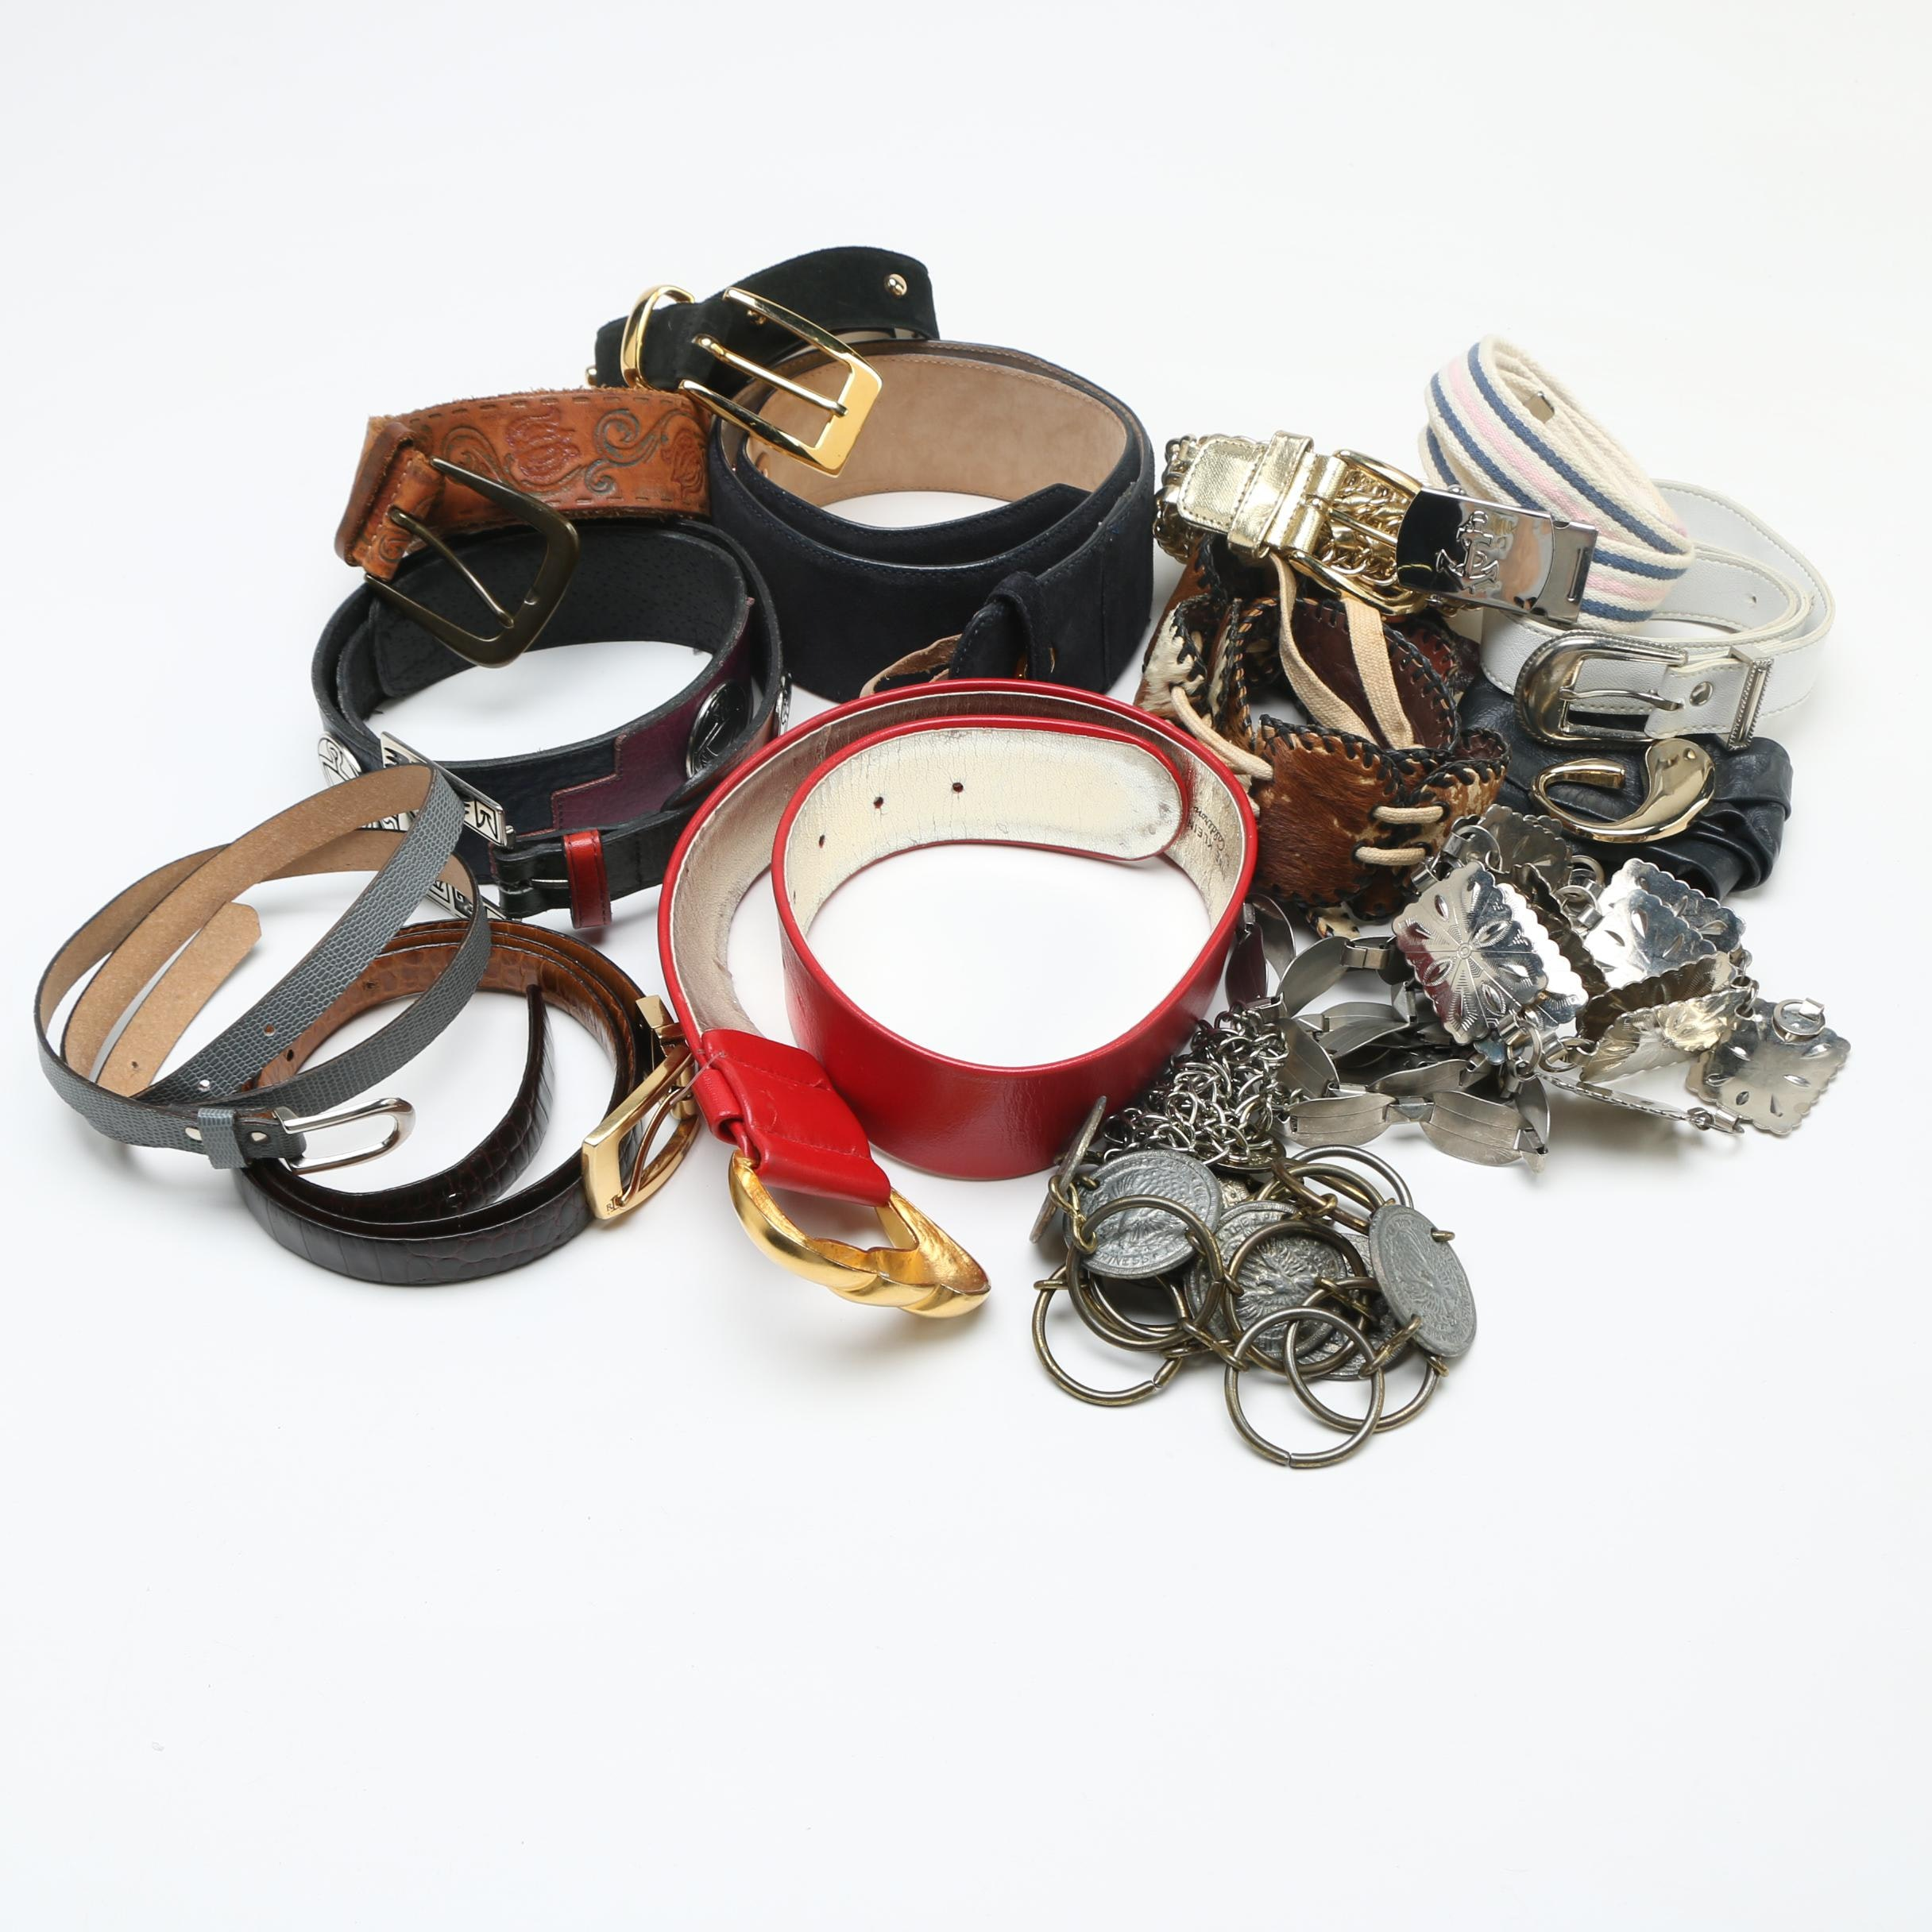 Large Assortment of Women's Vintage Belts